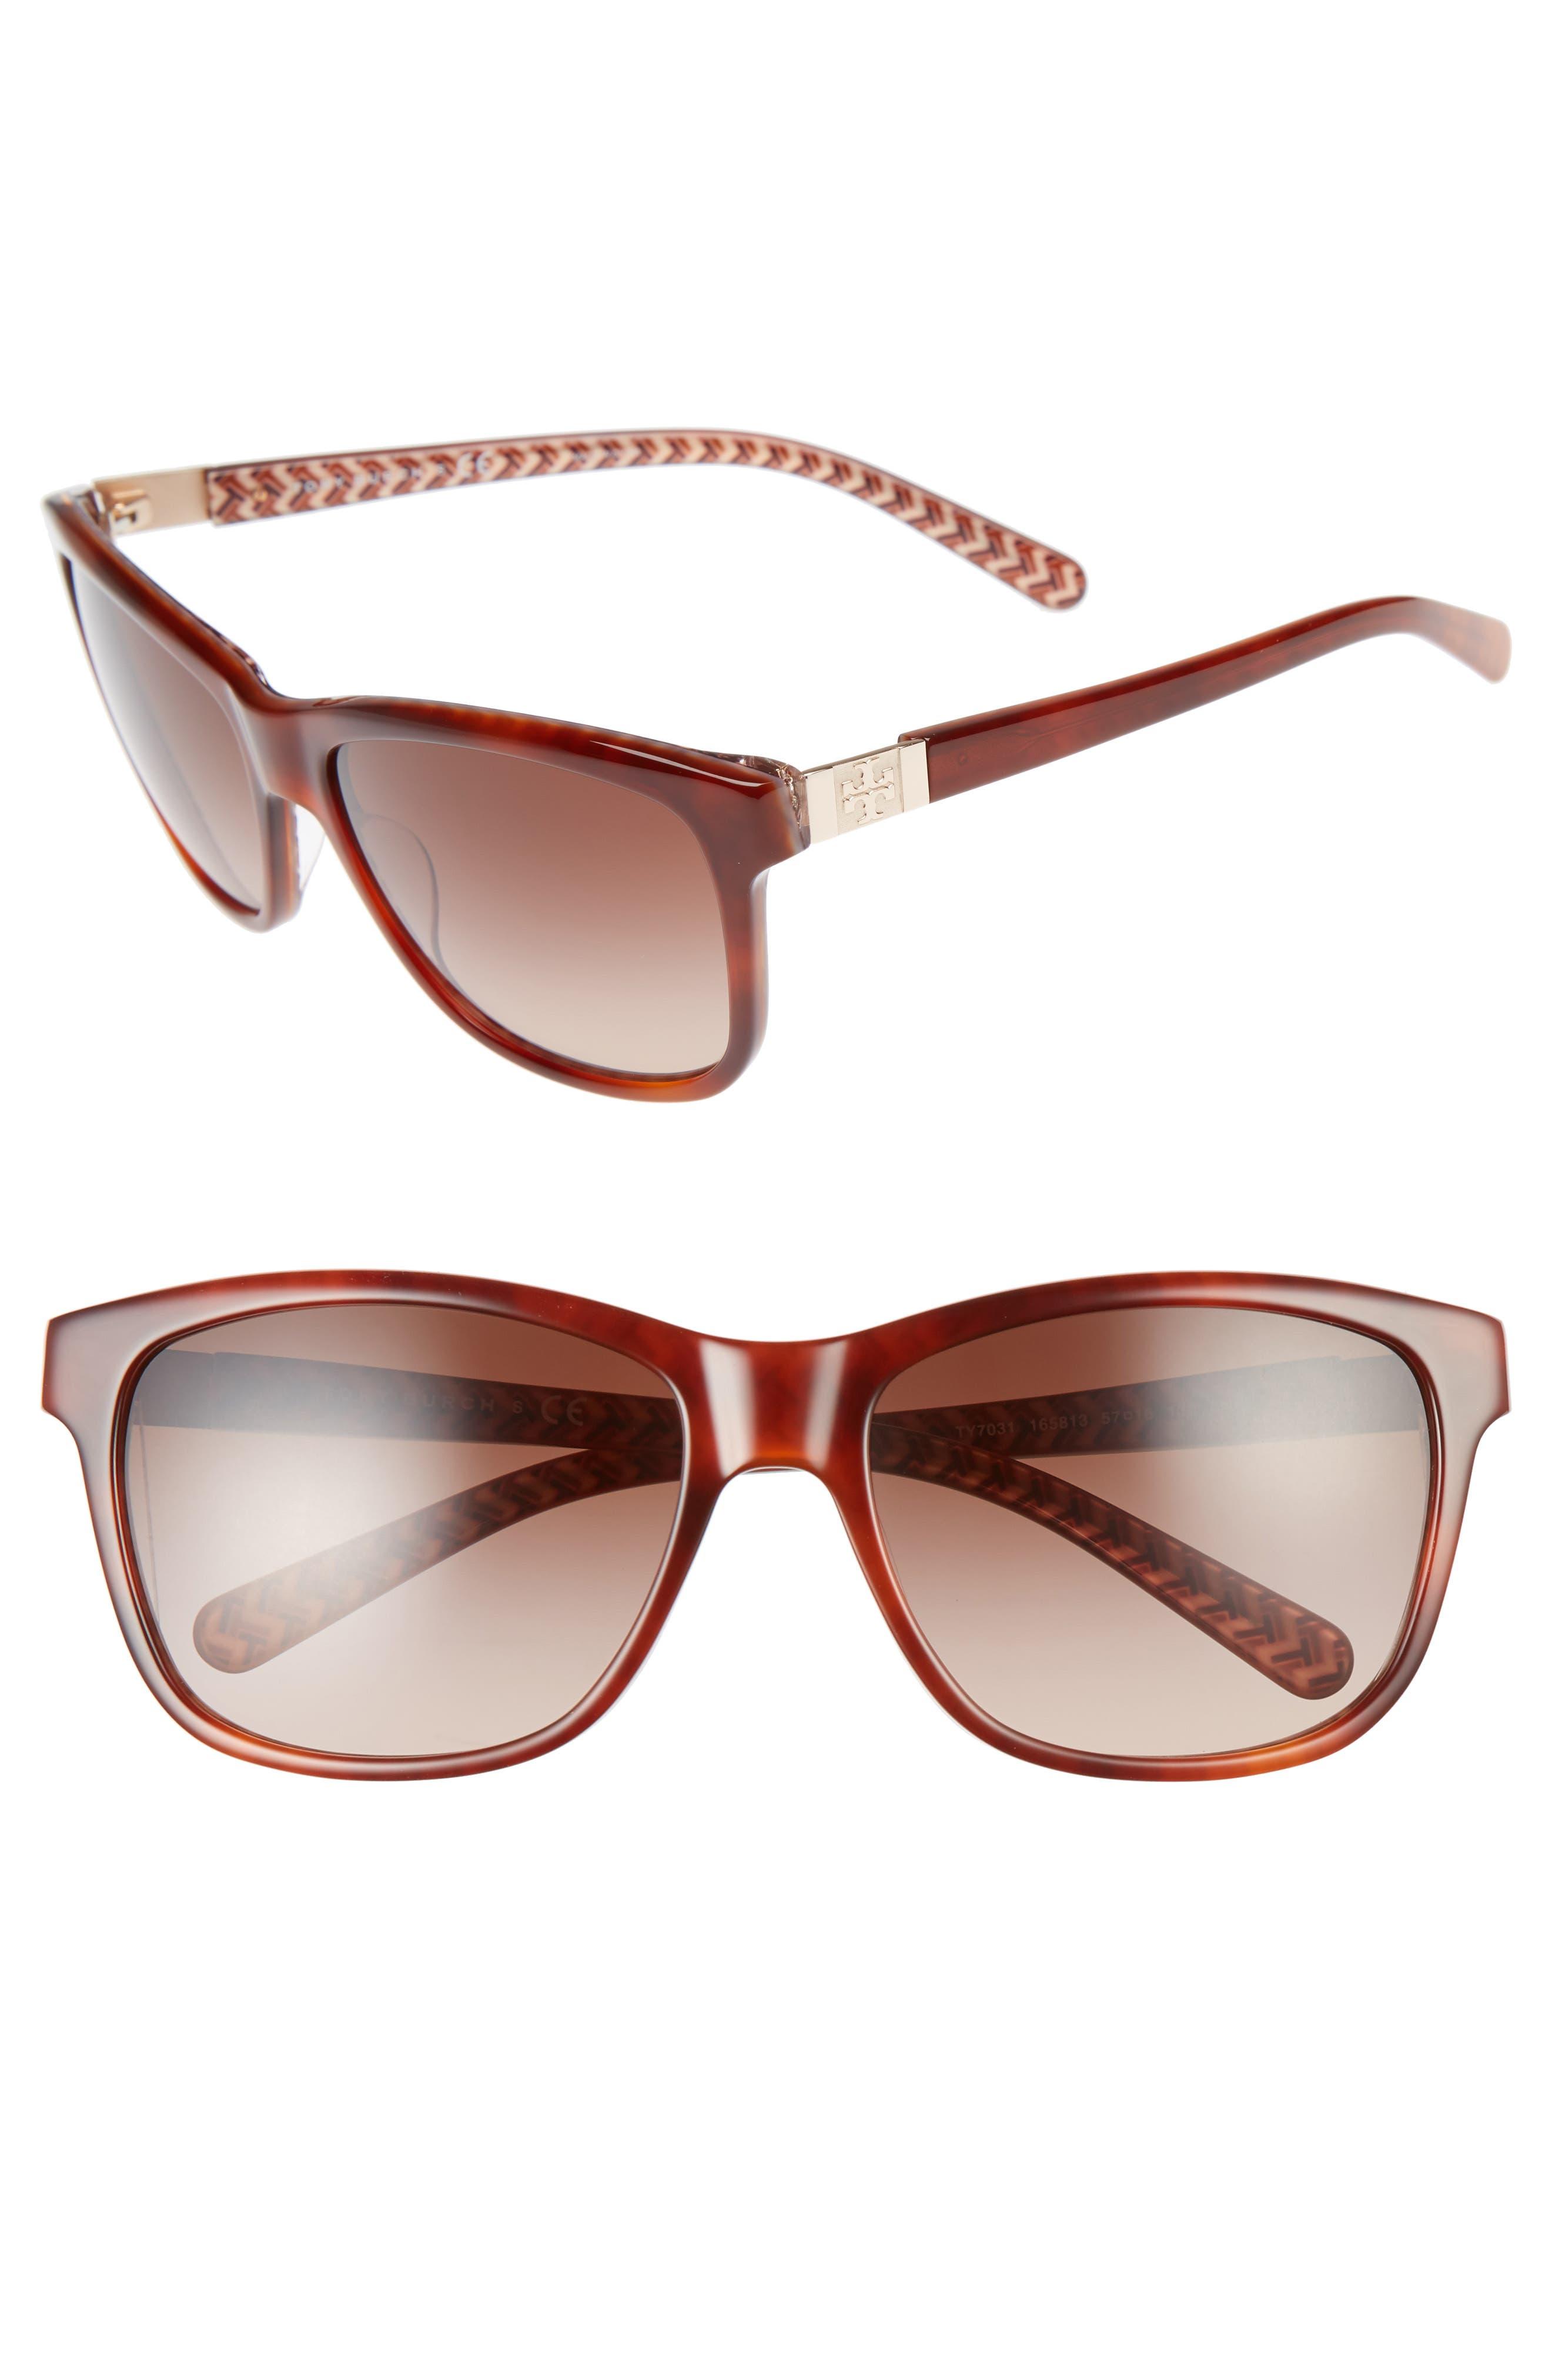 Tory Burch 57mm Gradient Sunglasses